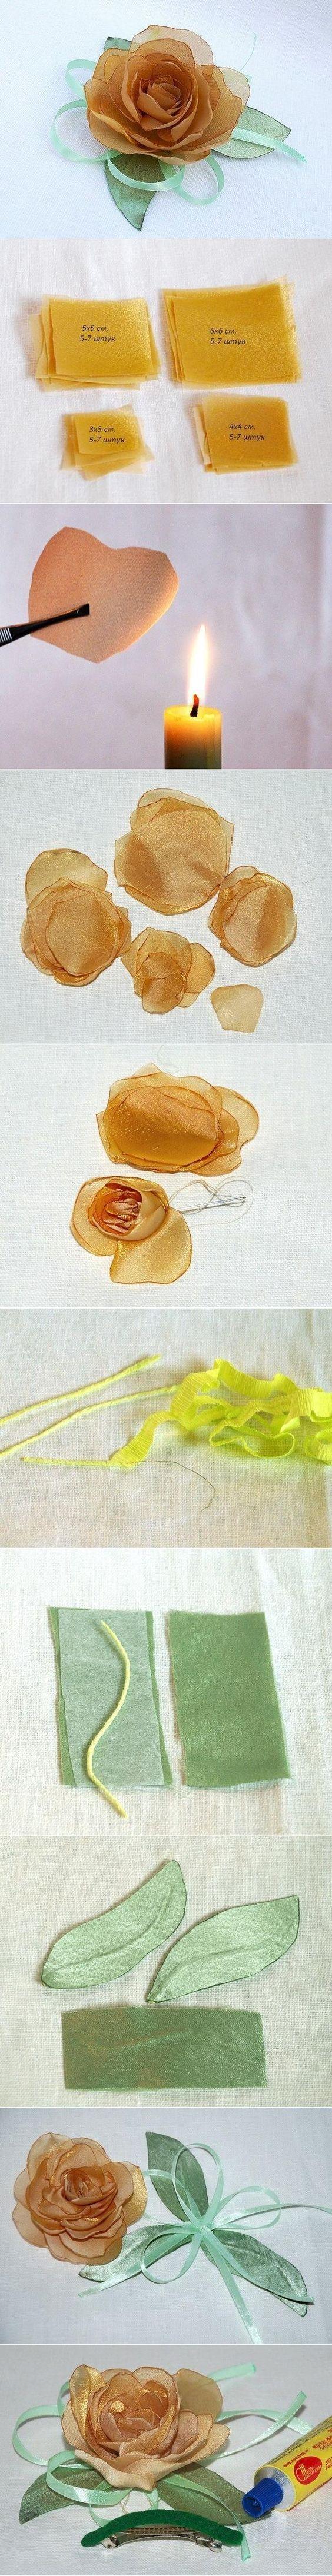 Рецепт вишневого ликера в домашних условиях - рецепт 12